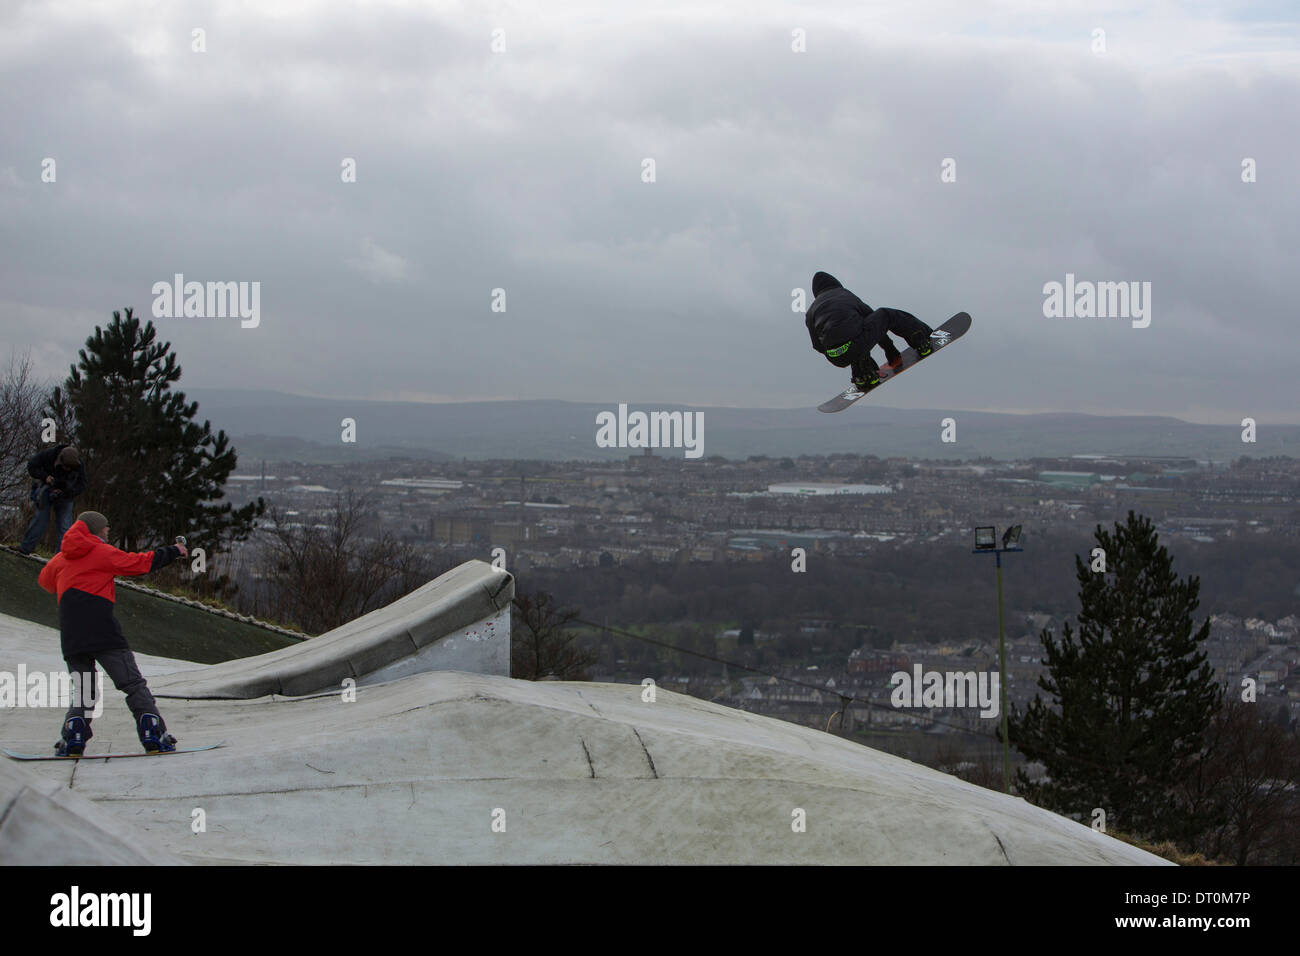 Action image of Jamie Nicholls, taken at Halifax dryslope, West Yorkshire - Stock Image